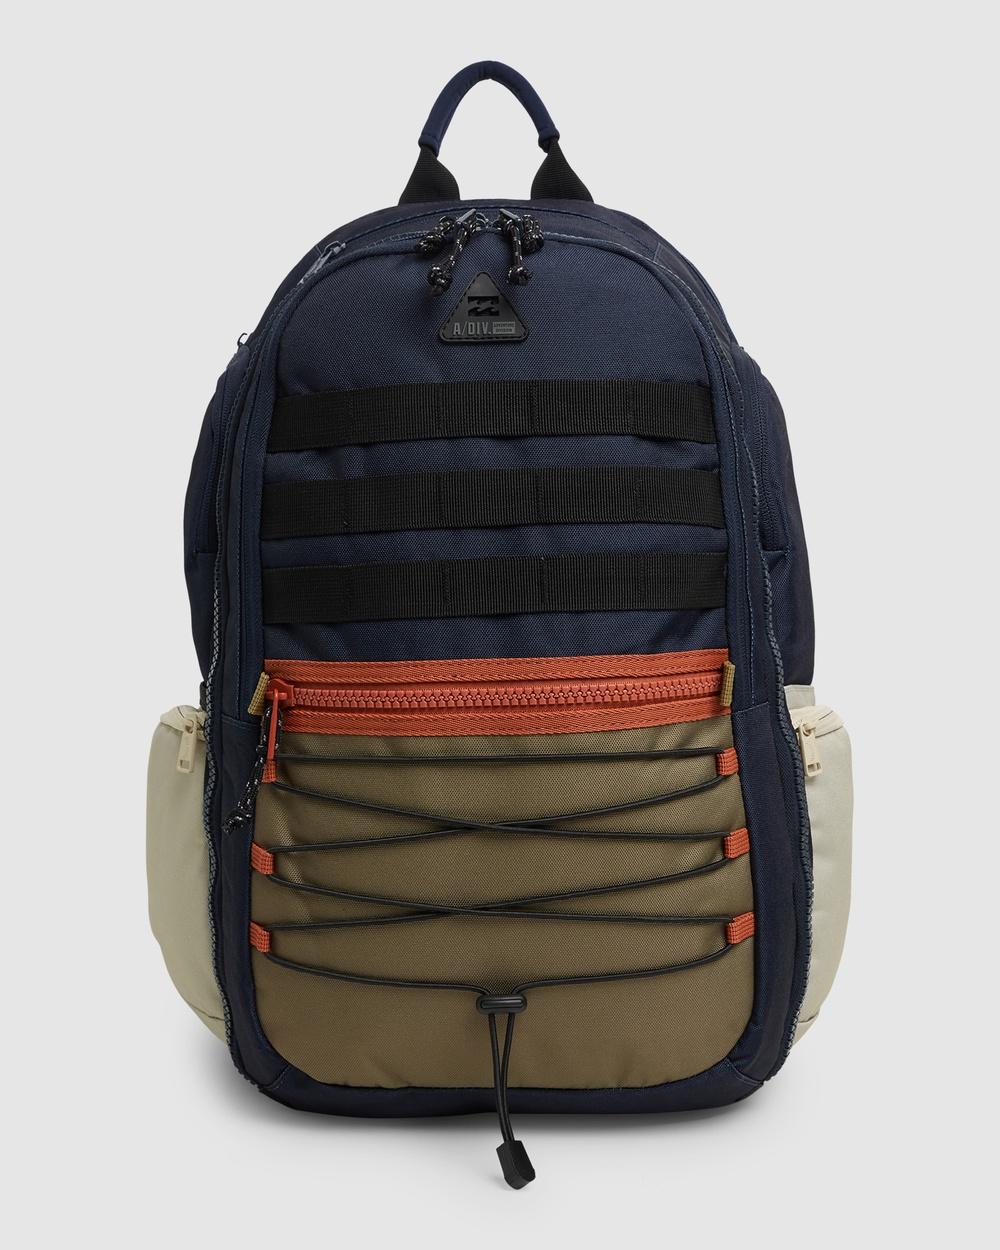 Billabong Adventure Division Combat Backpack Outdoors NAVY